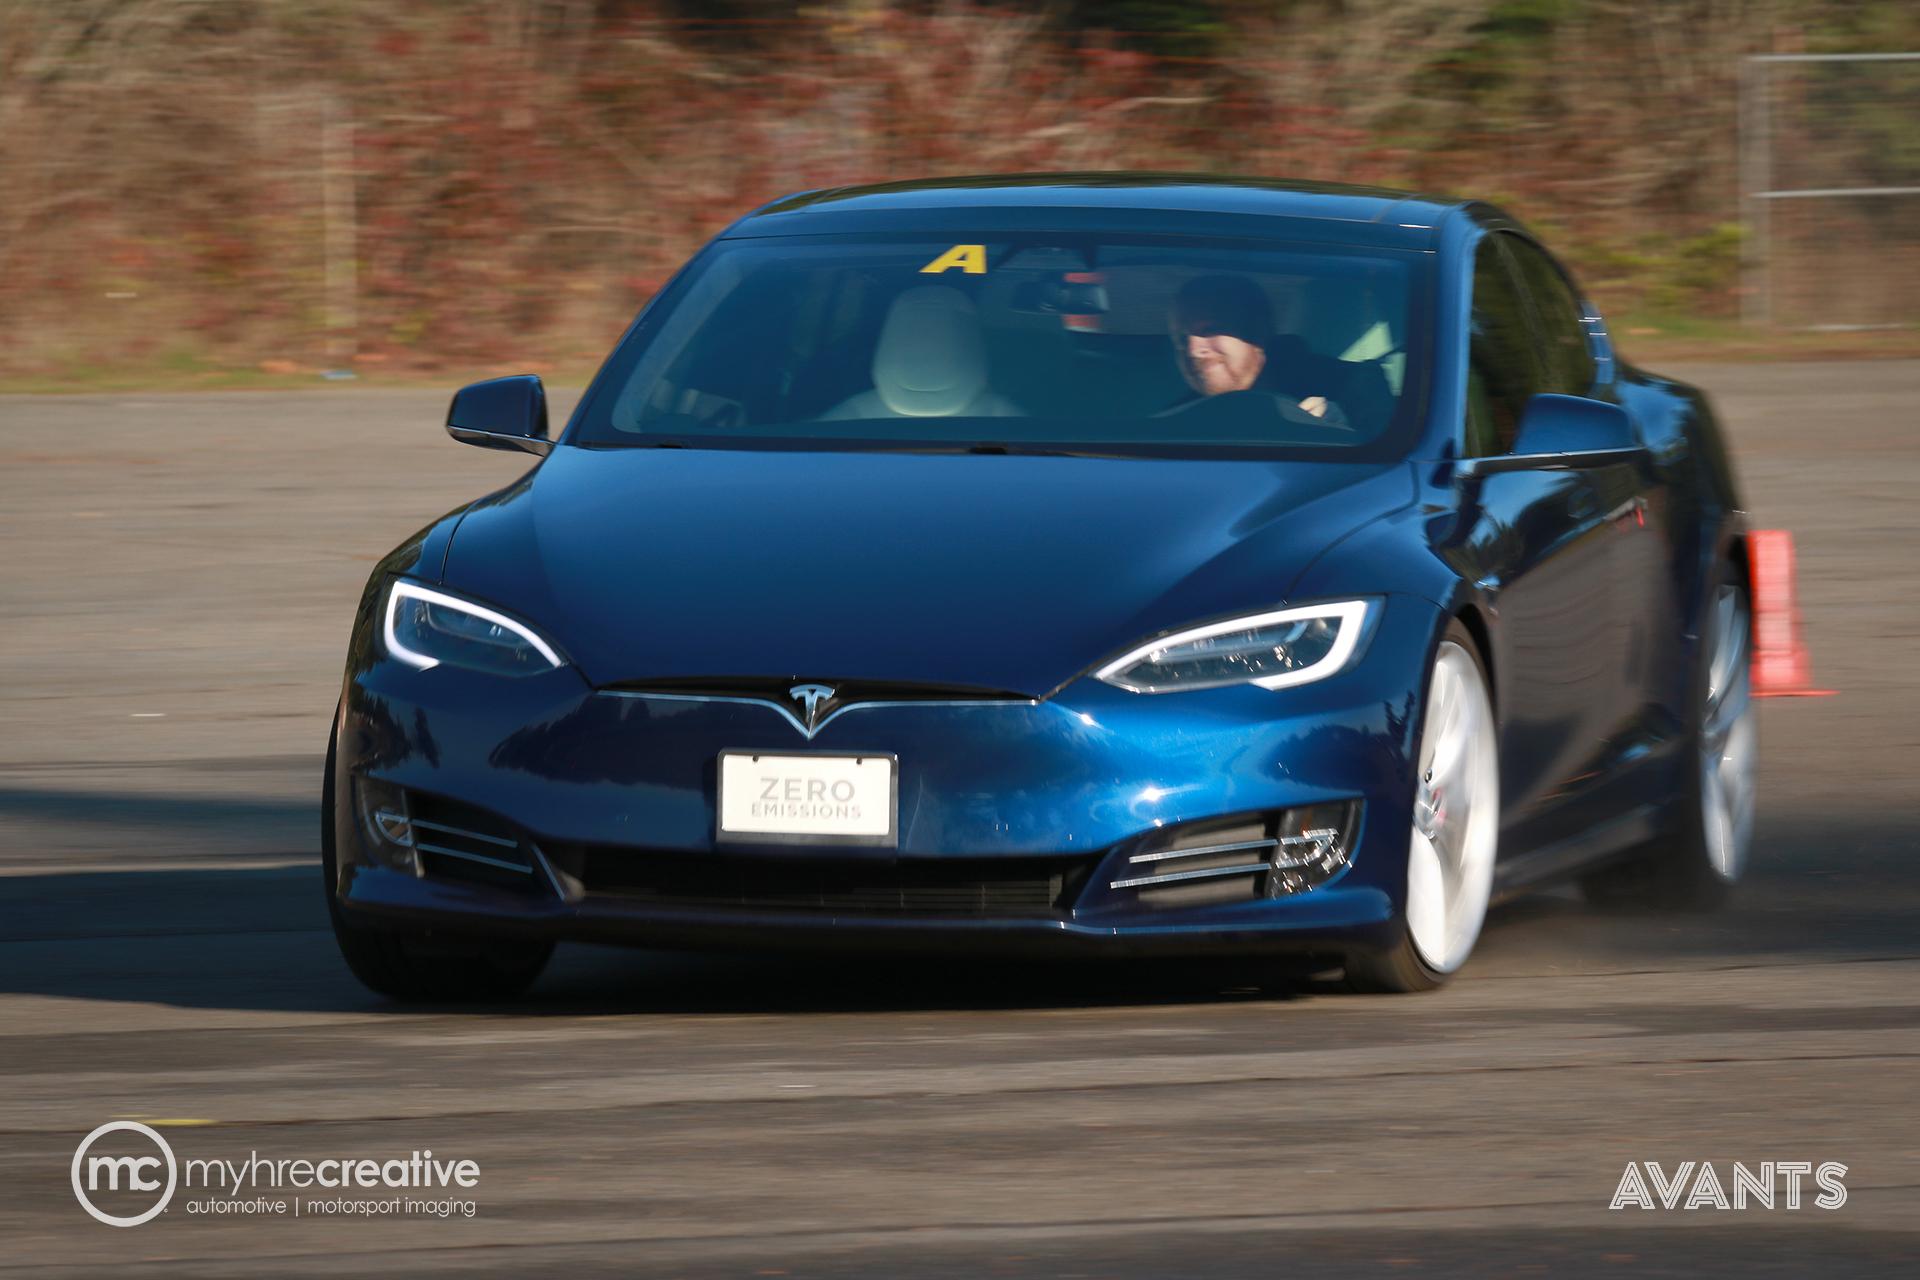 Tesla_MyhreCreative_Avants_01.jpg